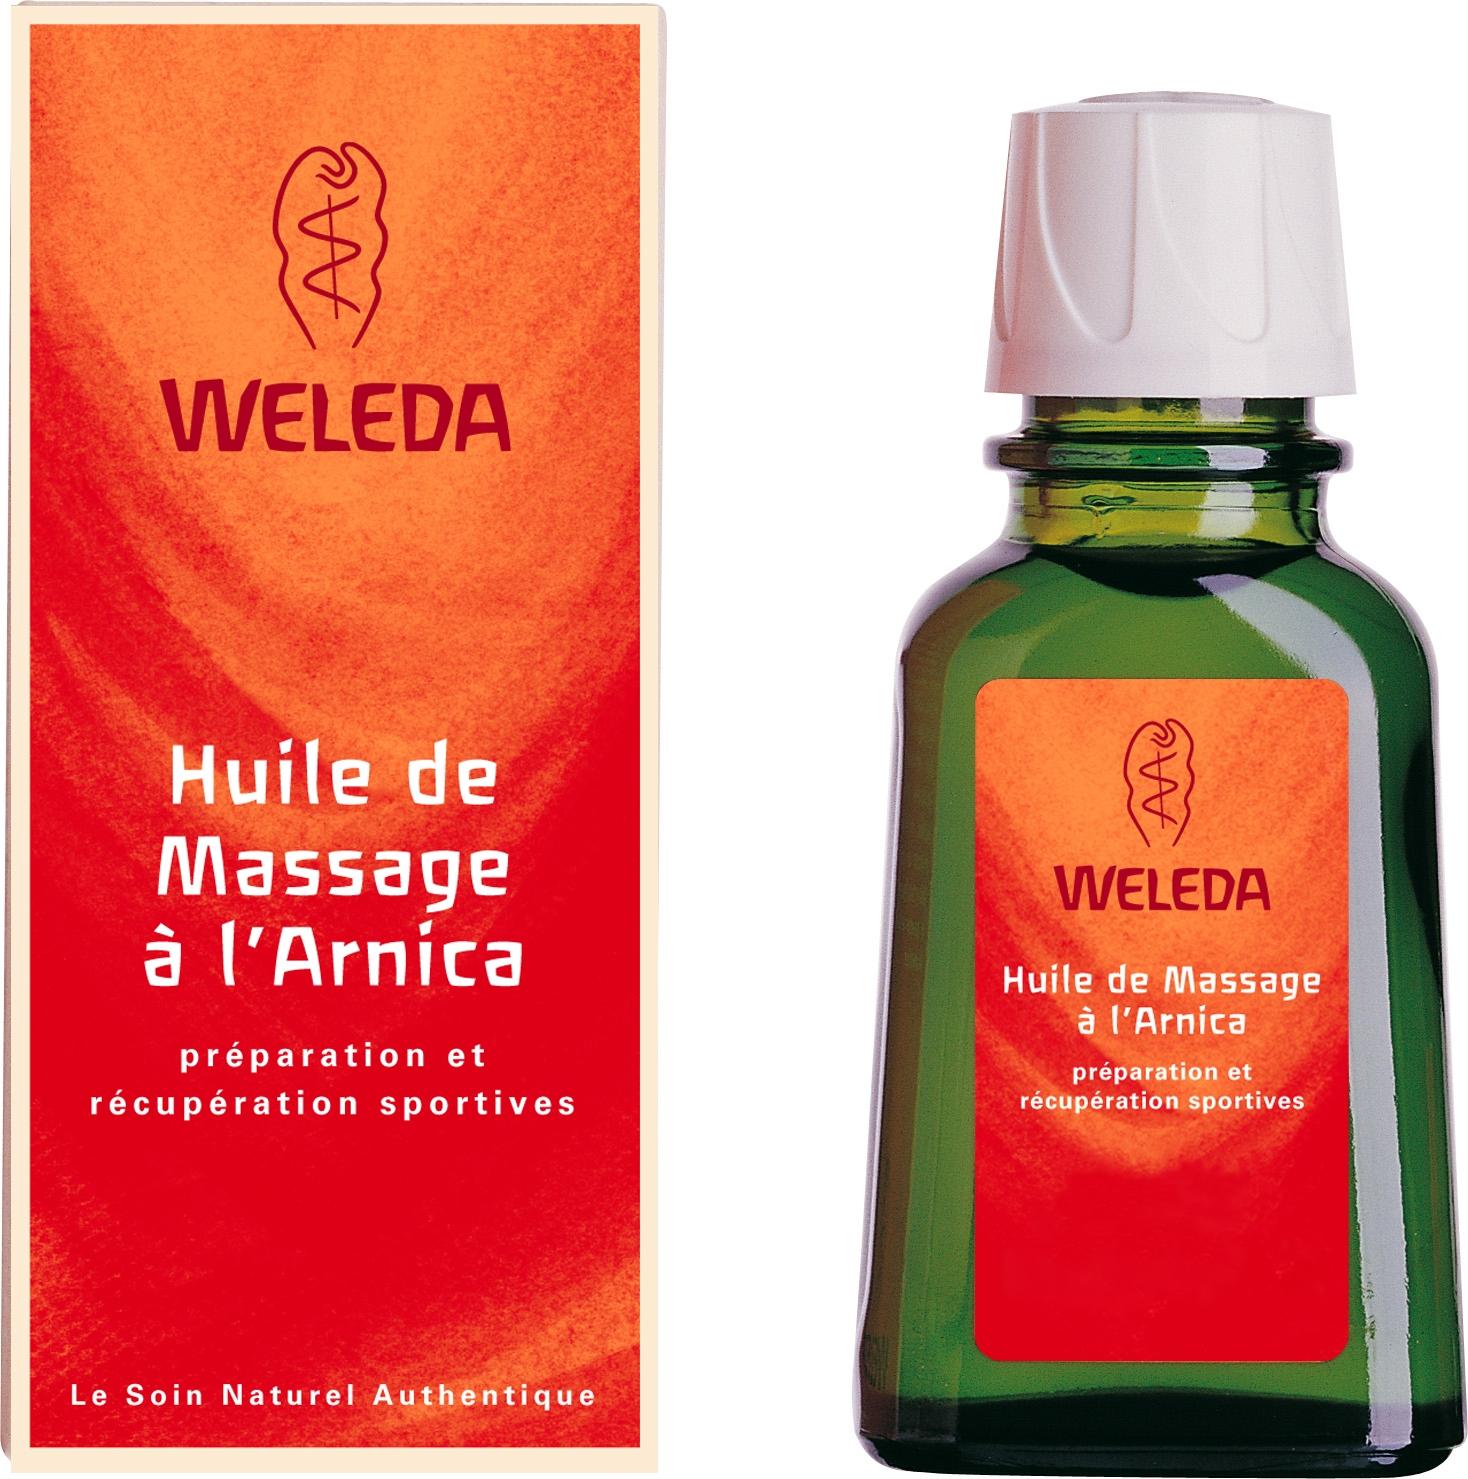 WELEDA huile_massage arnica_50ml